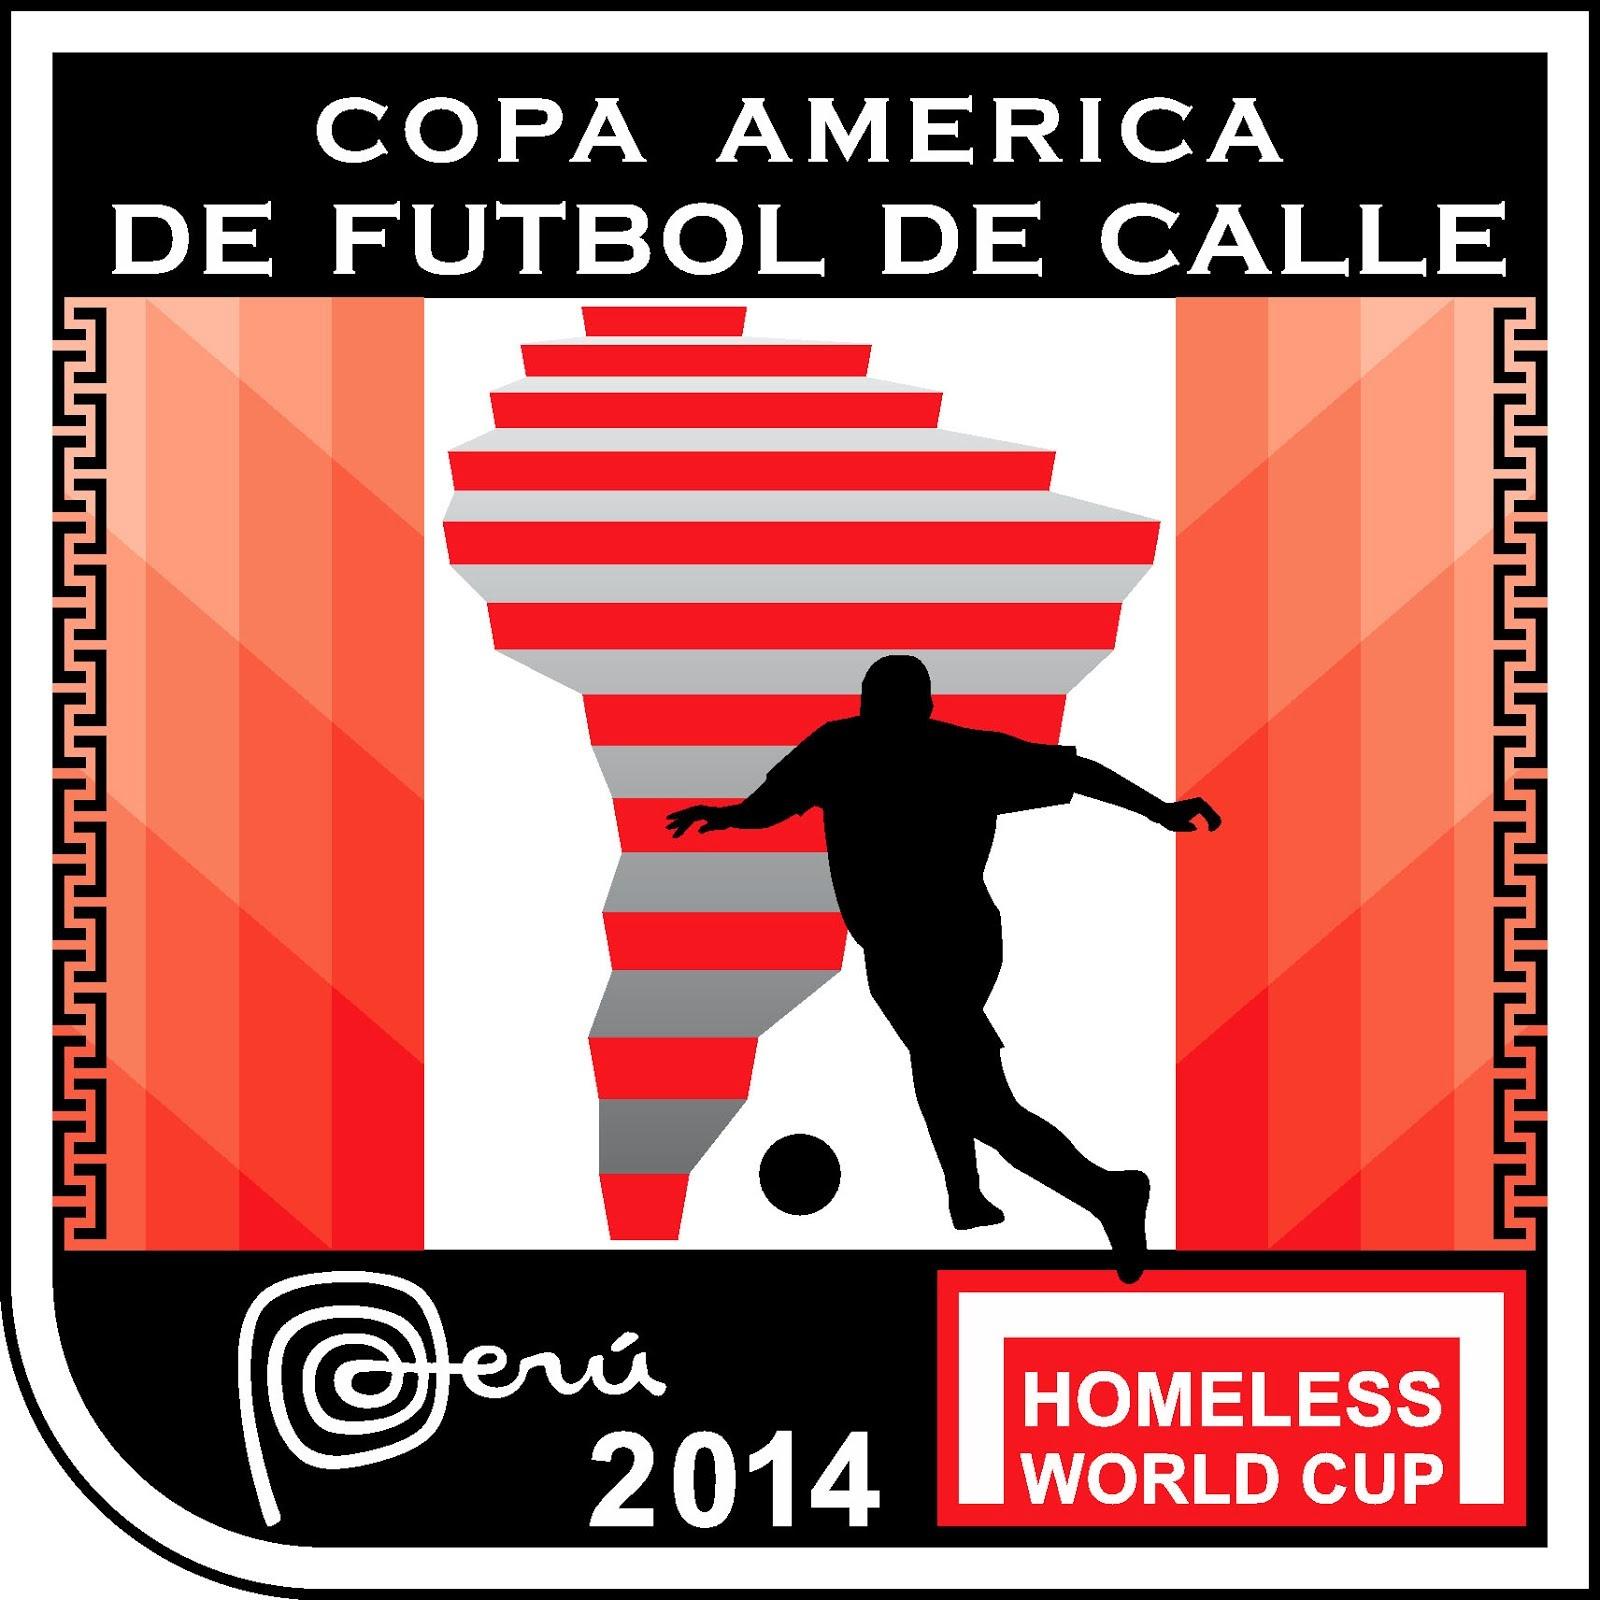 Copa America de Futbol de Calle